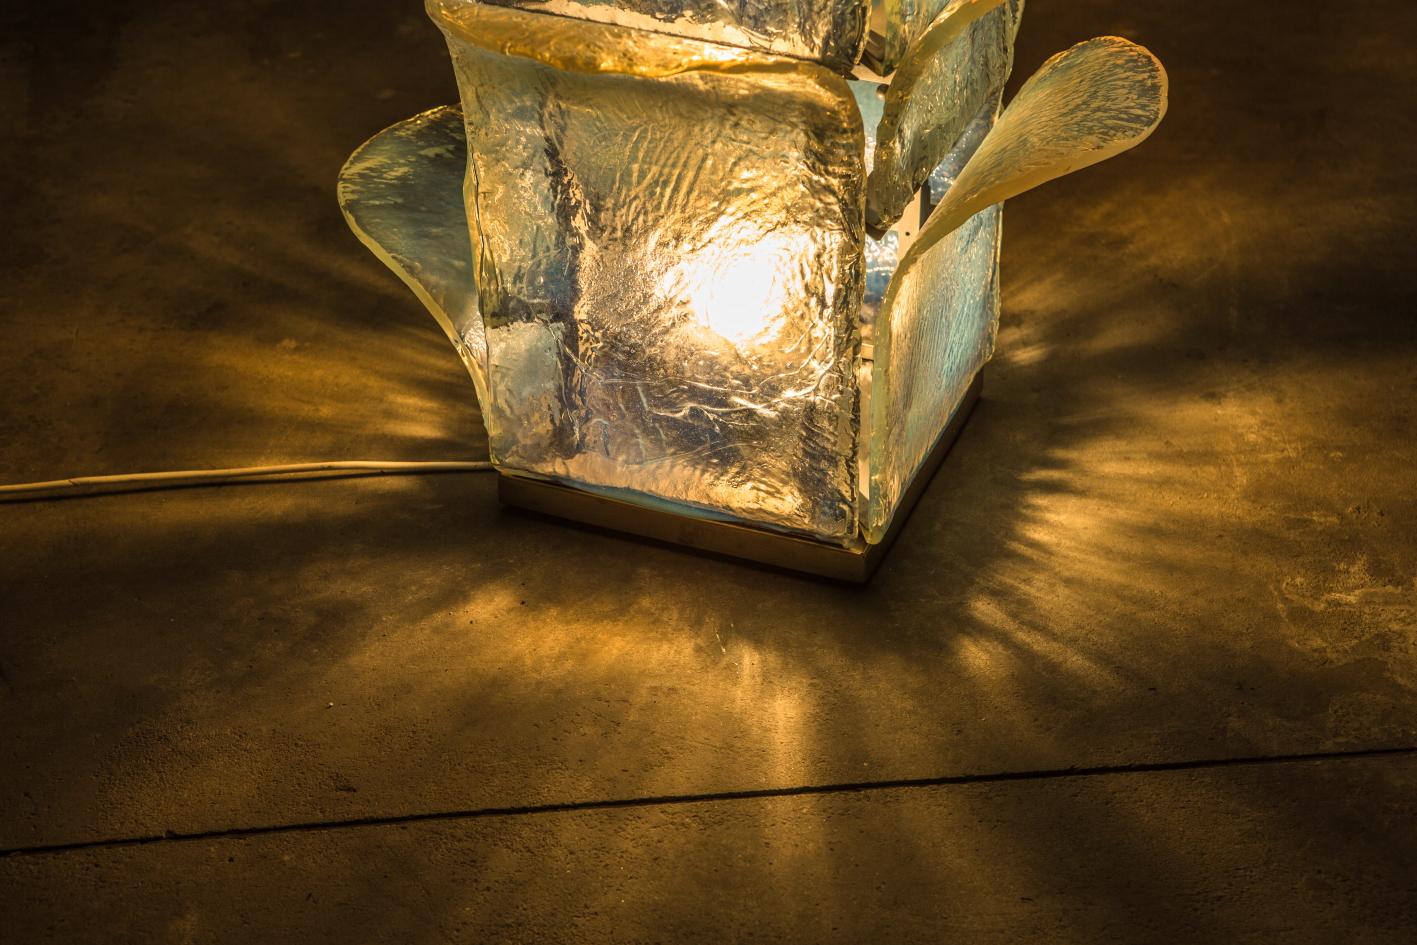 Floor lamp LT320 - Carlo Nason for Mazzega - Base detail